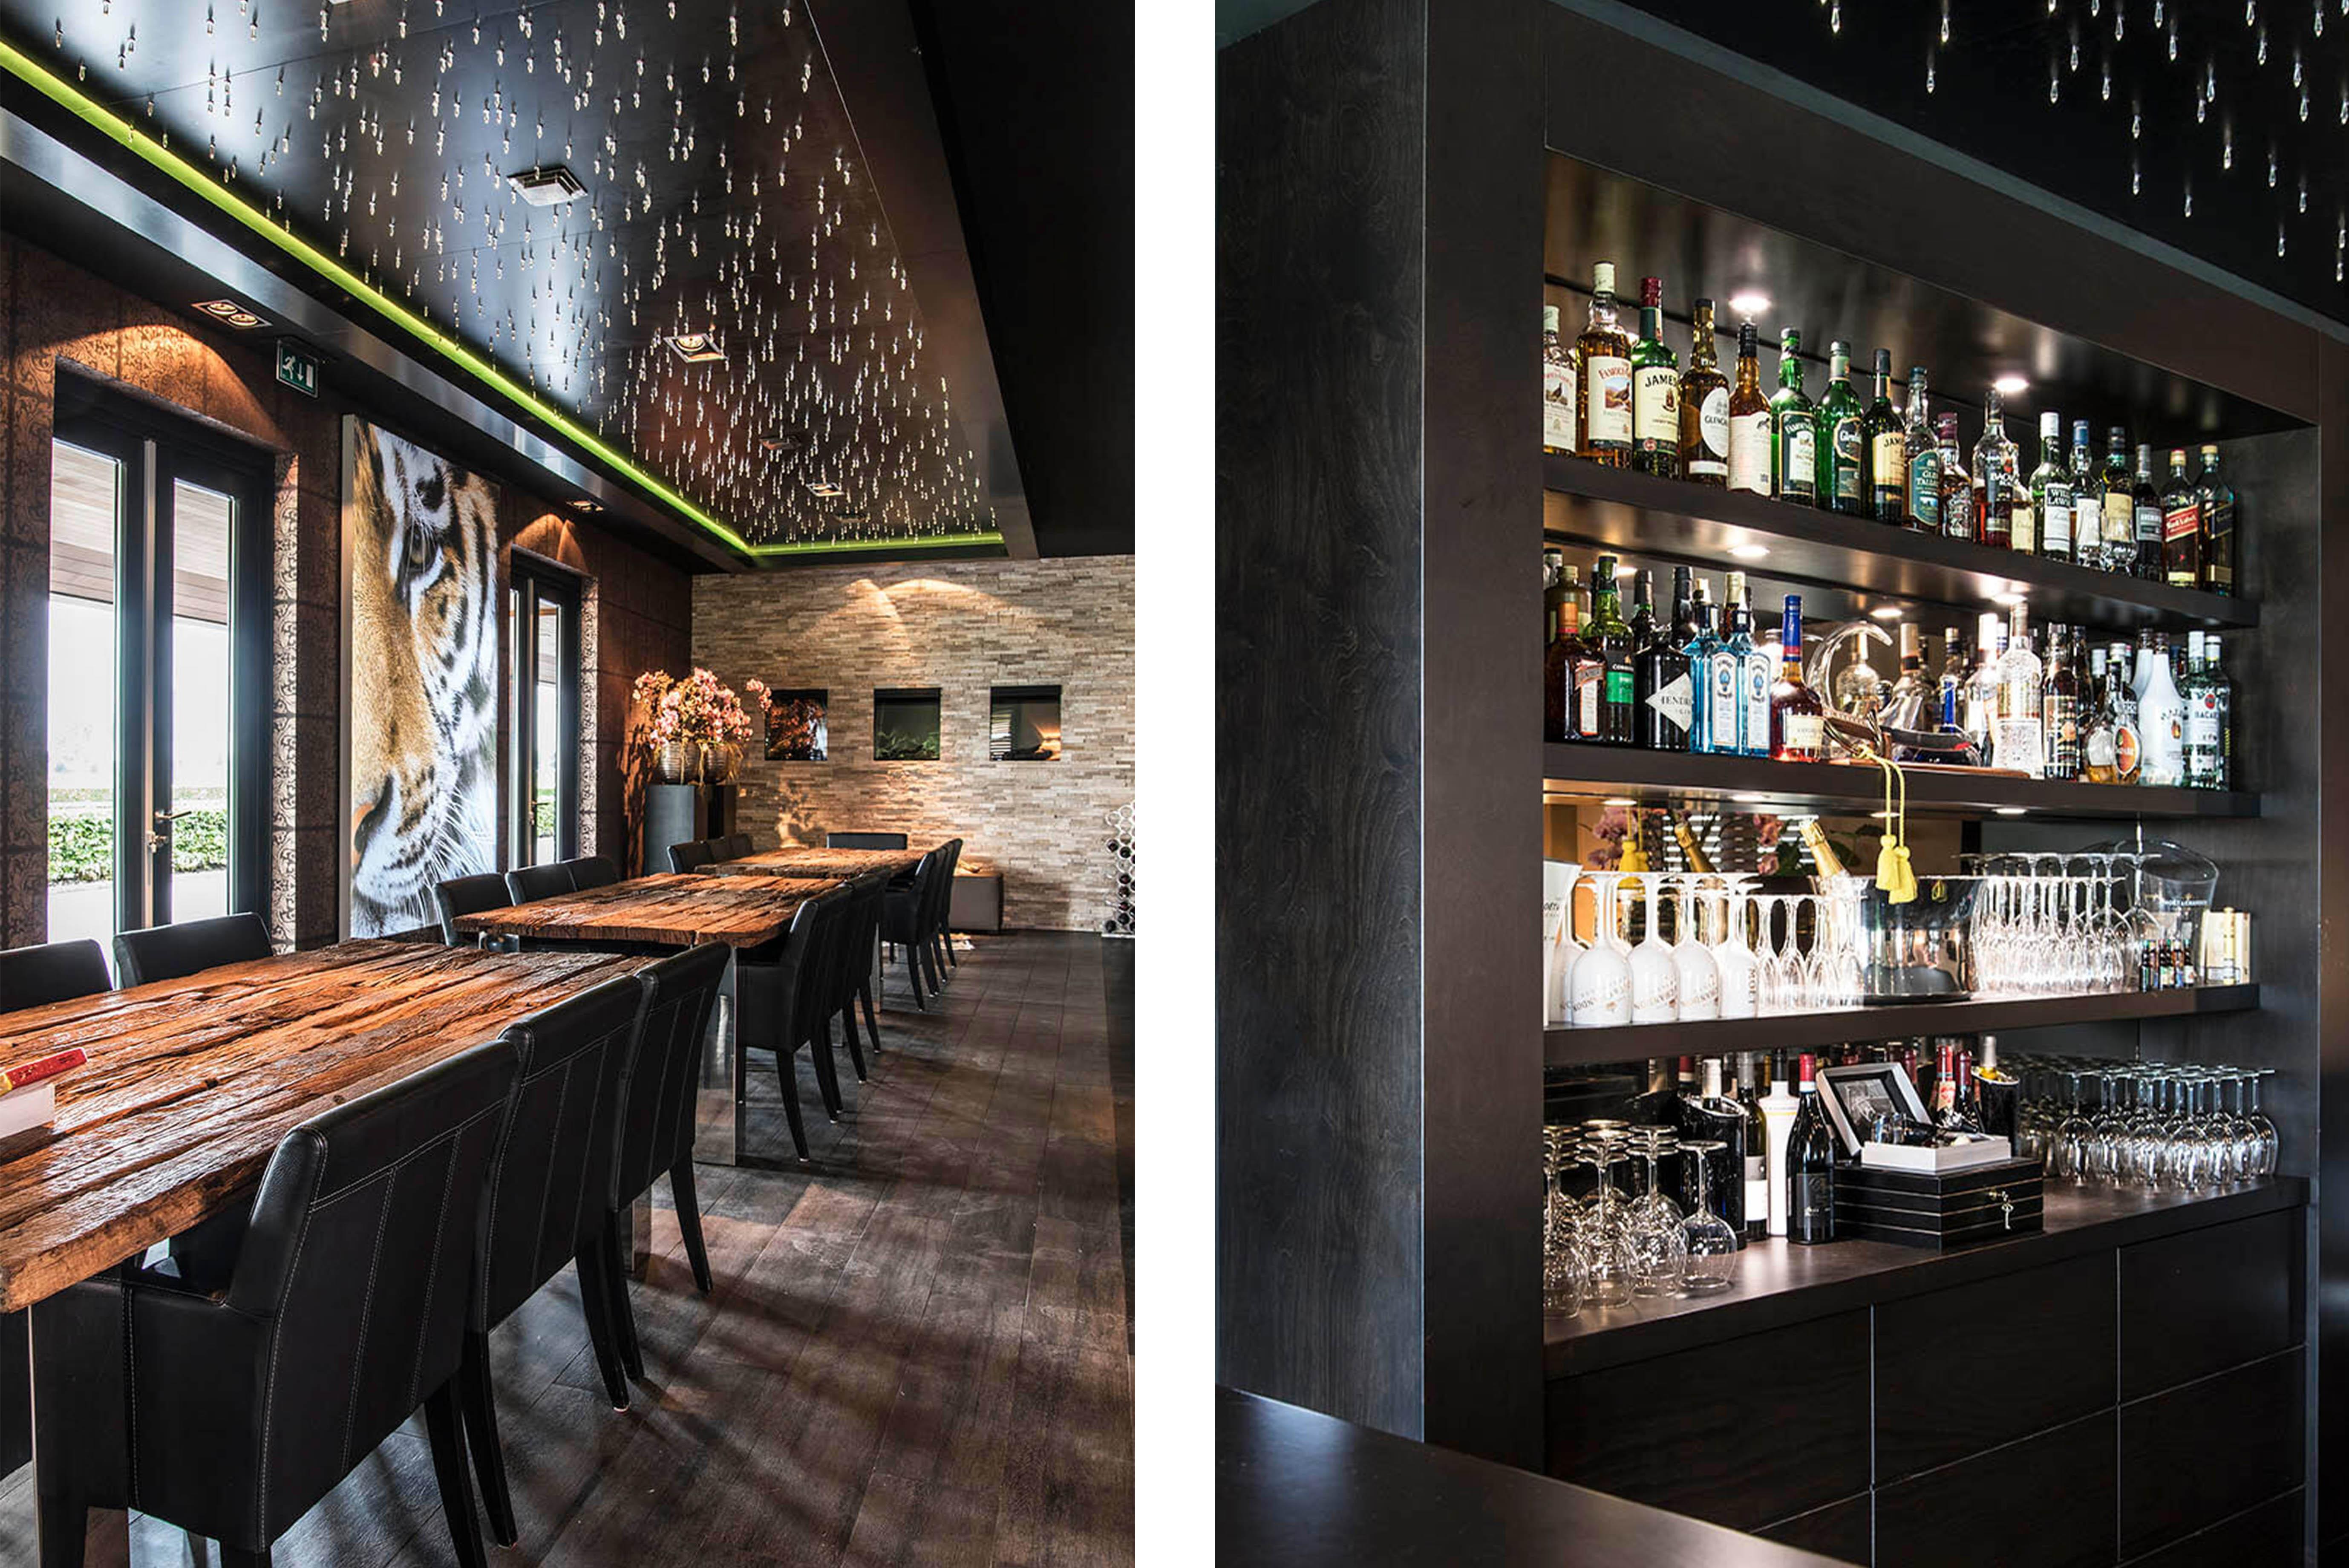 Strakke Interieur Ideeen.Interieur Bar Strak Machinaal Timmerbedrijf De Waard B V